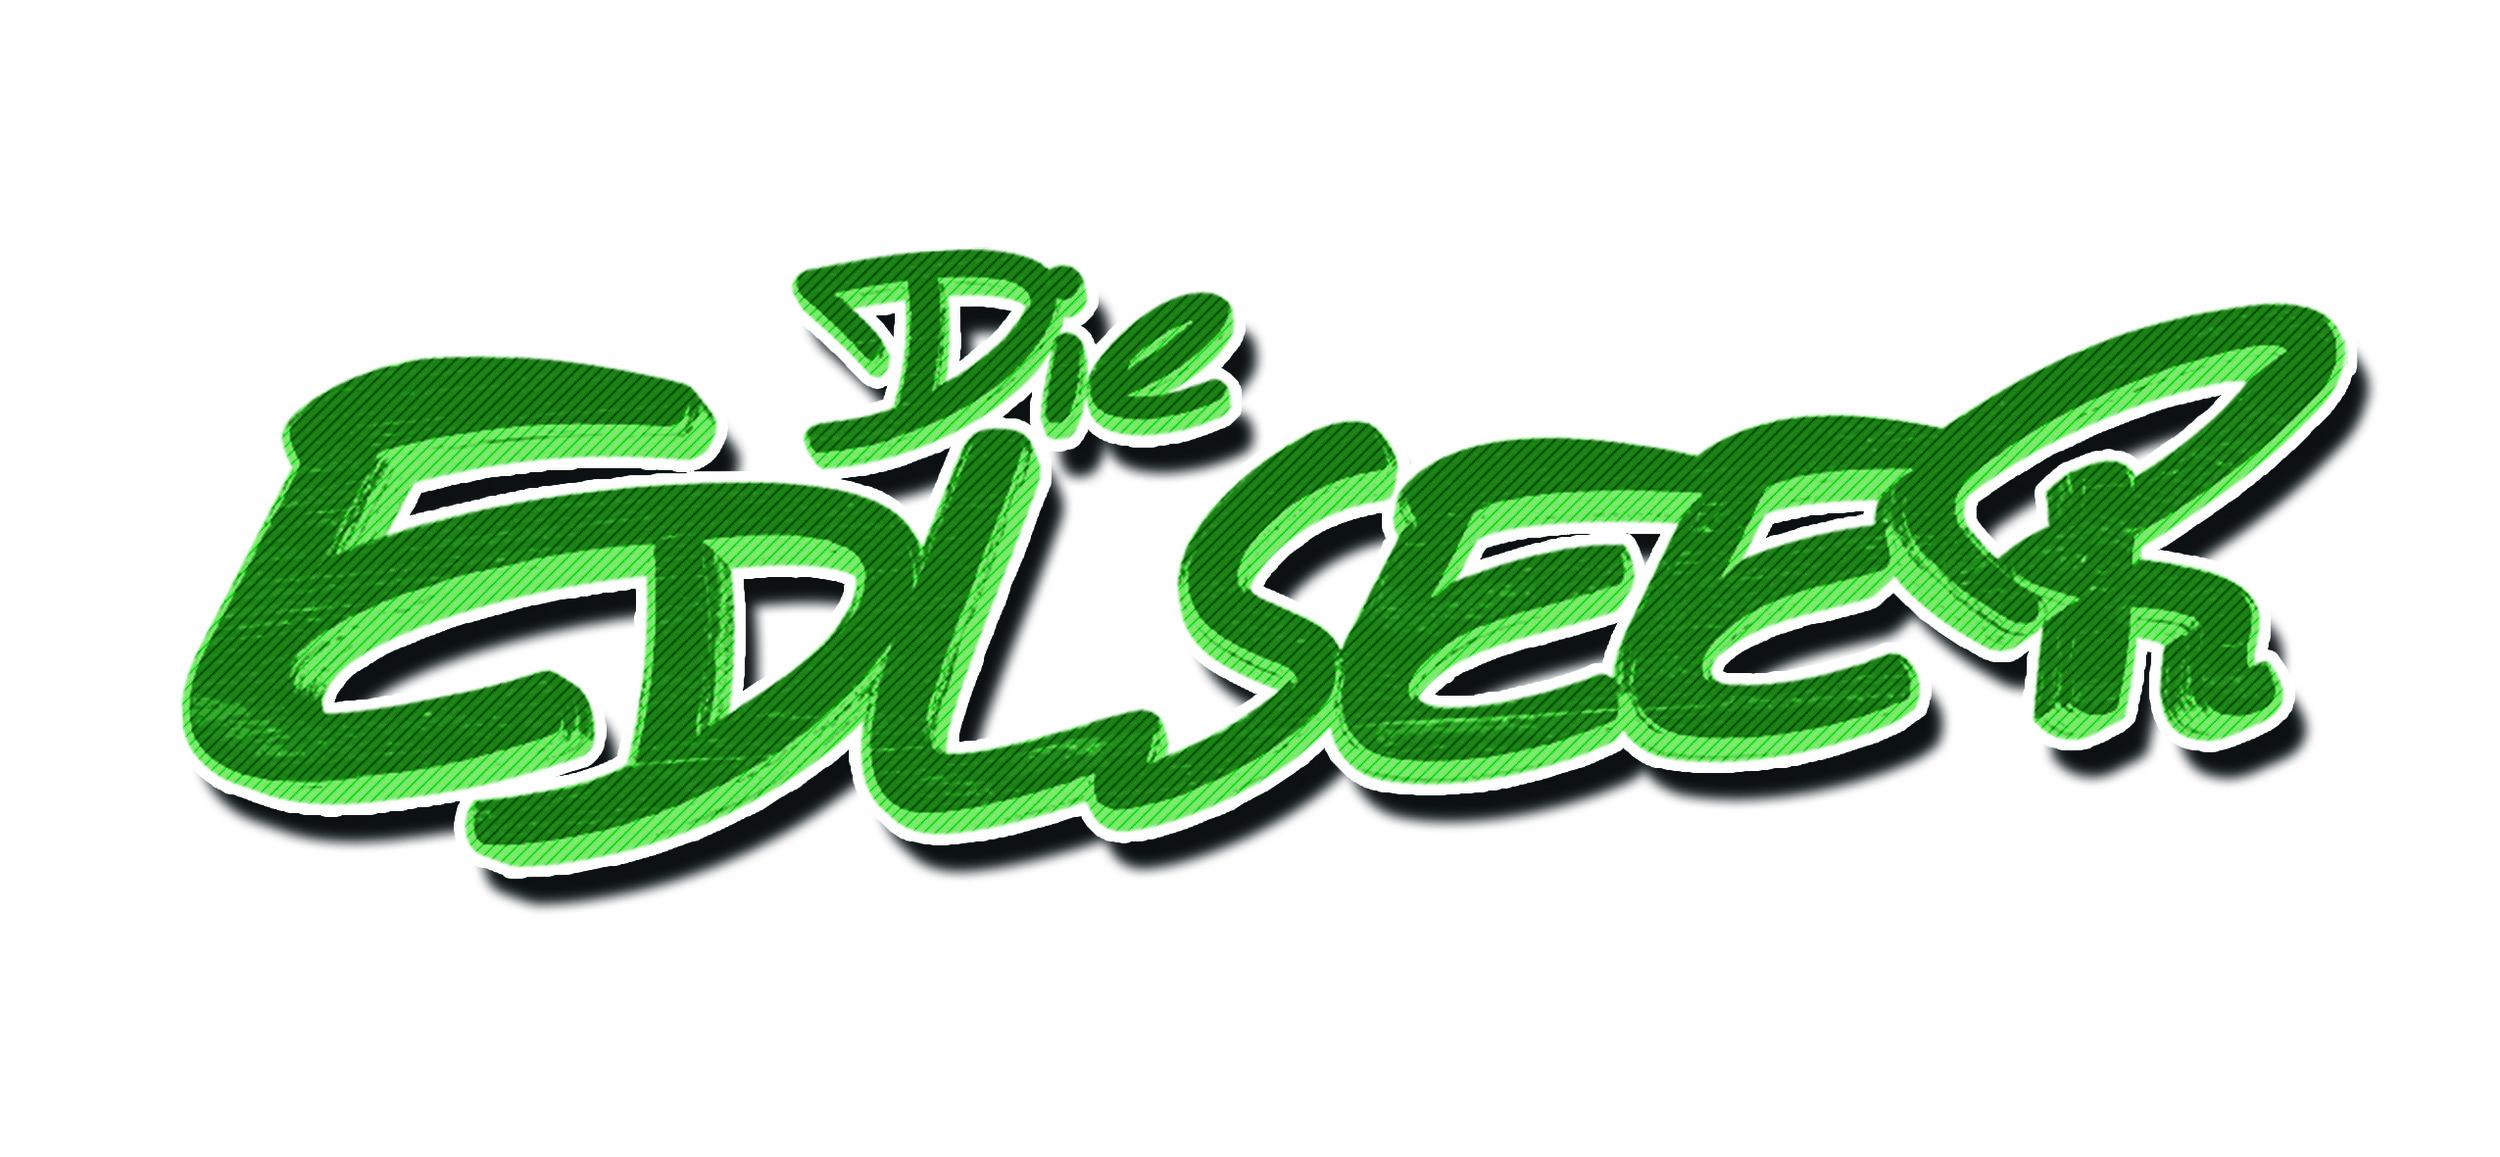 Edlseer SZ grün.jpg